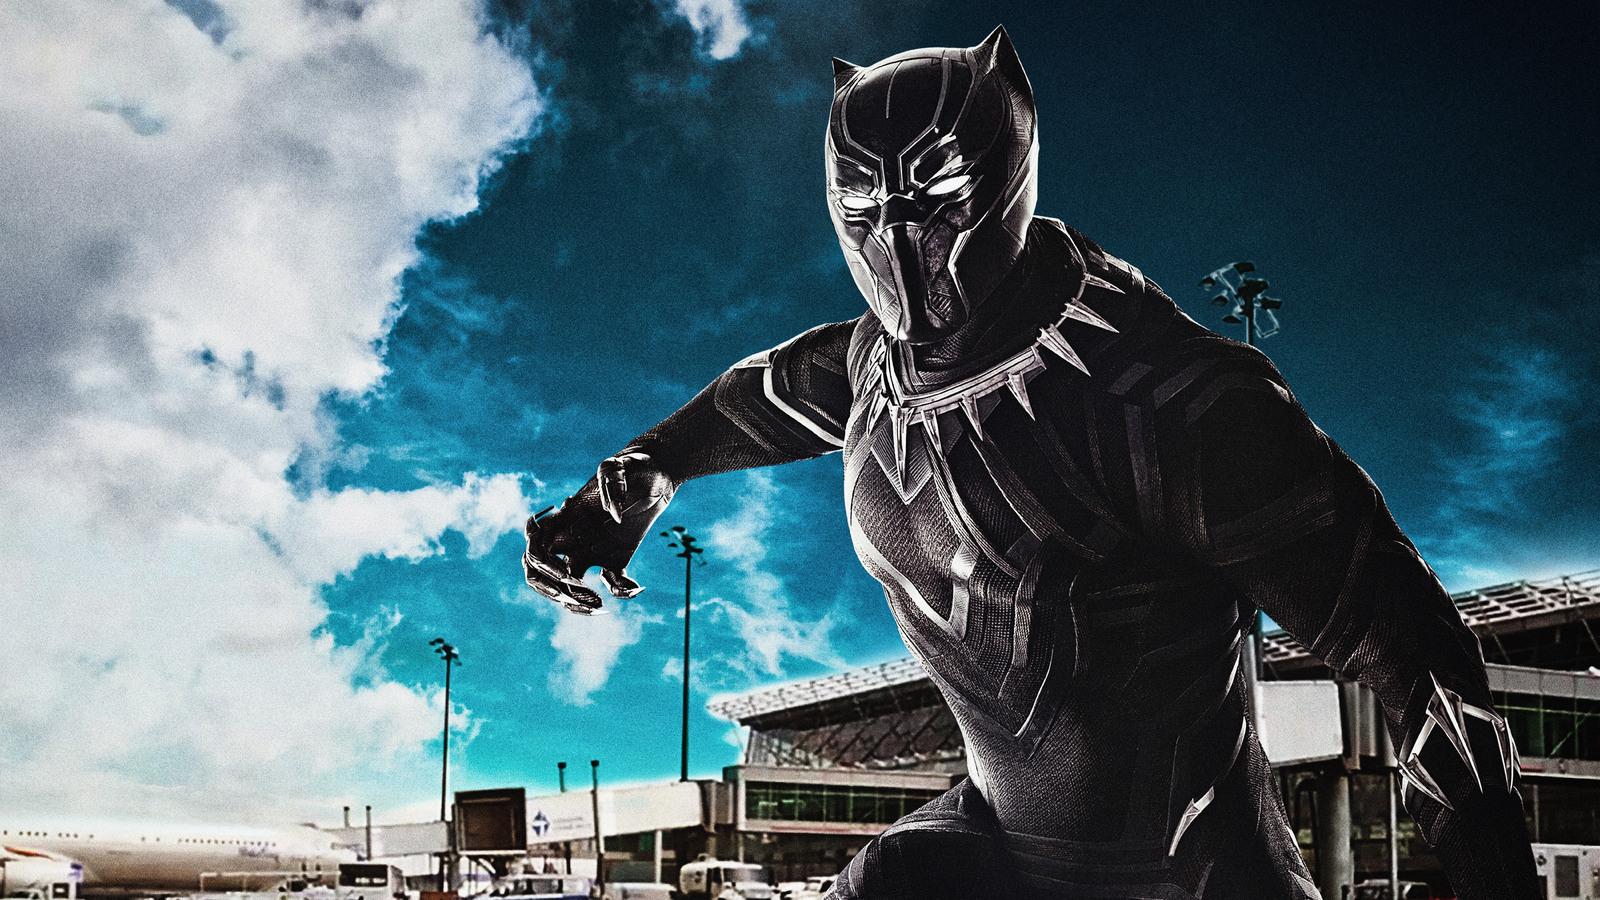 black-panther-captain-america-civil-war-8k-b6.jpg